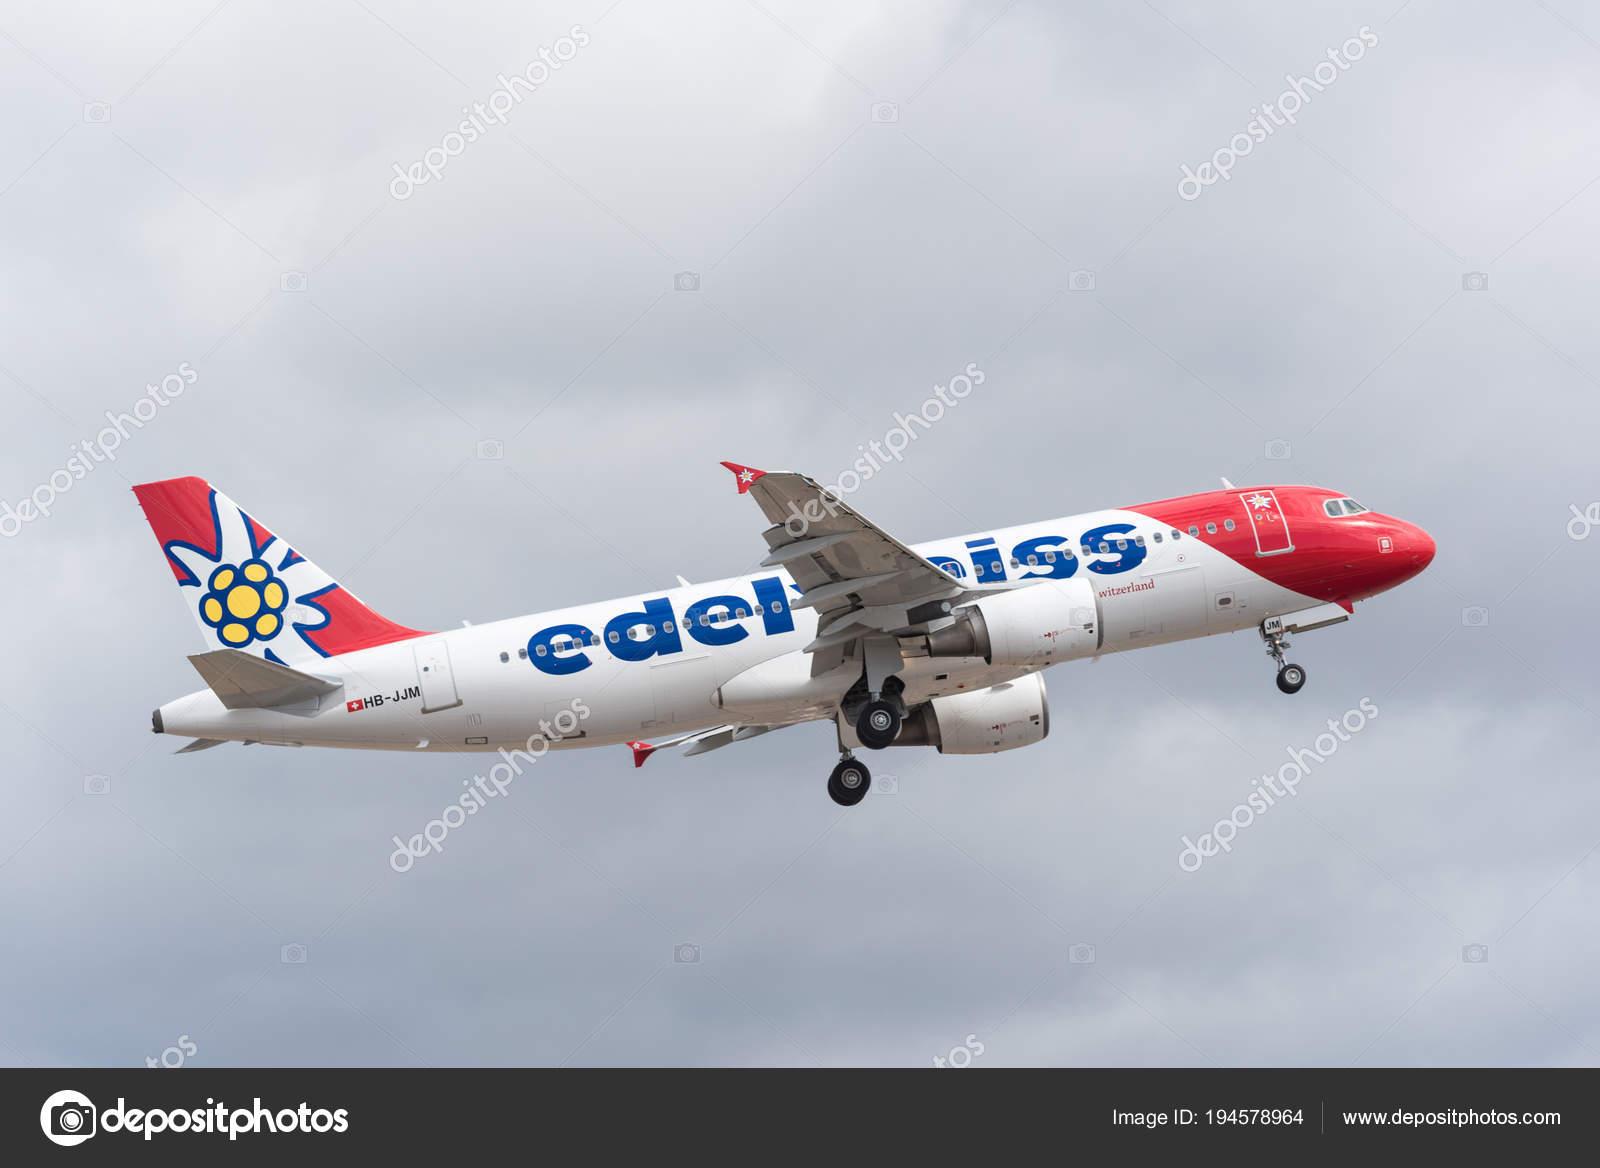 Aeroporto Tenerife Sud : Tenerife spagna 29 aprile 2018: edelweiss airbus a320 decollo